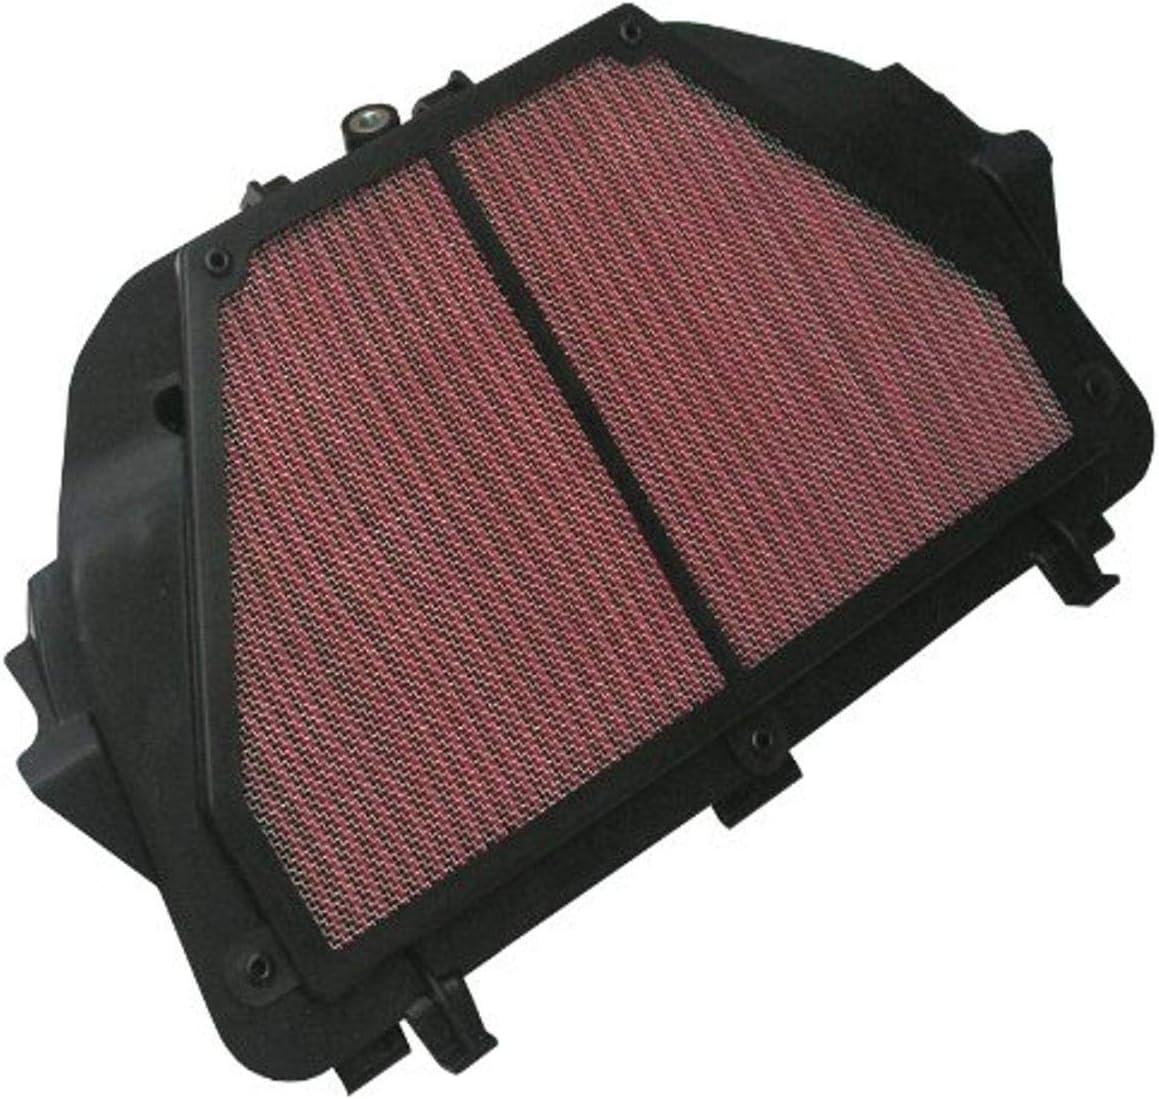 Hiflofiltro HFA4614 Premium OE Replacement Air Filter, Black